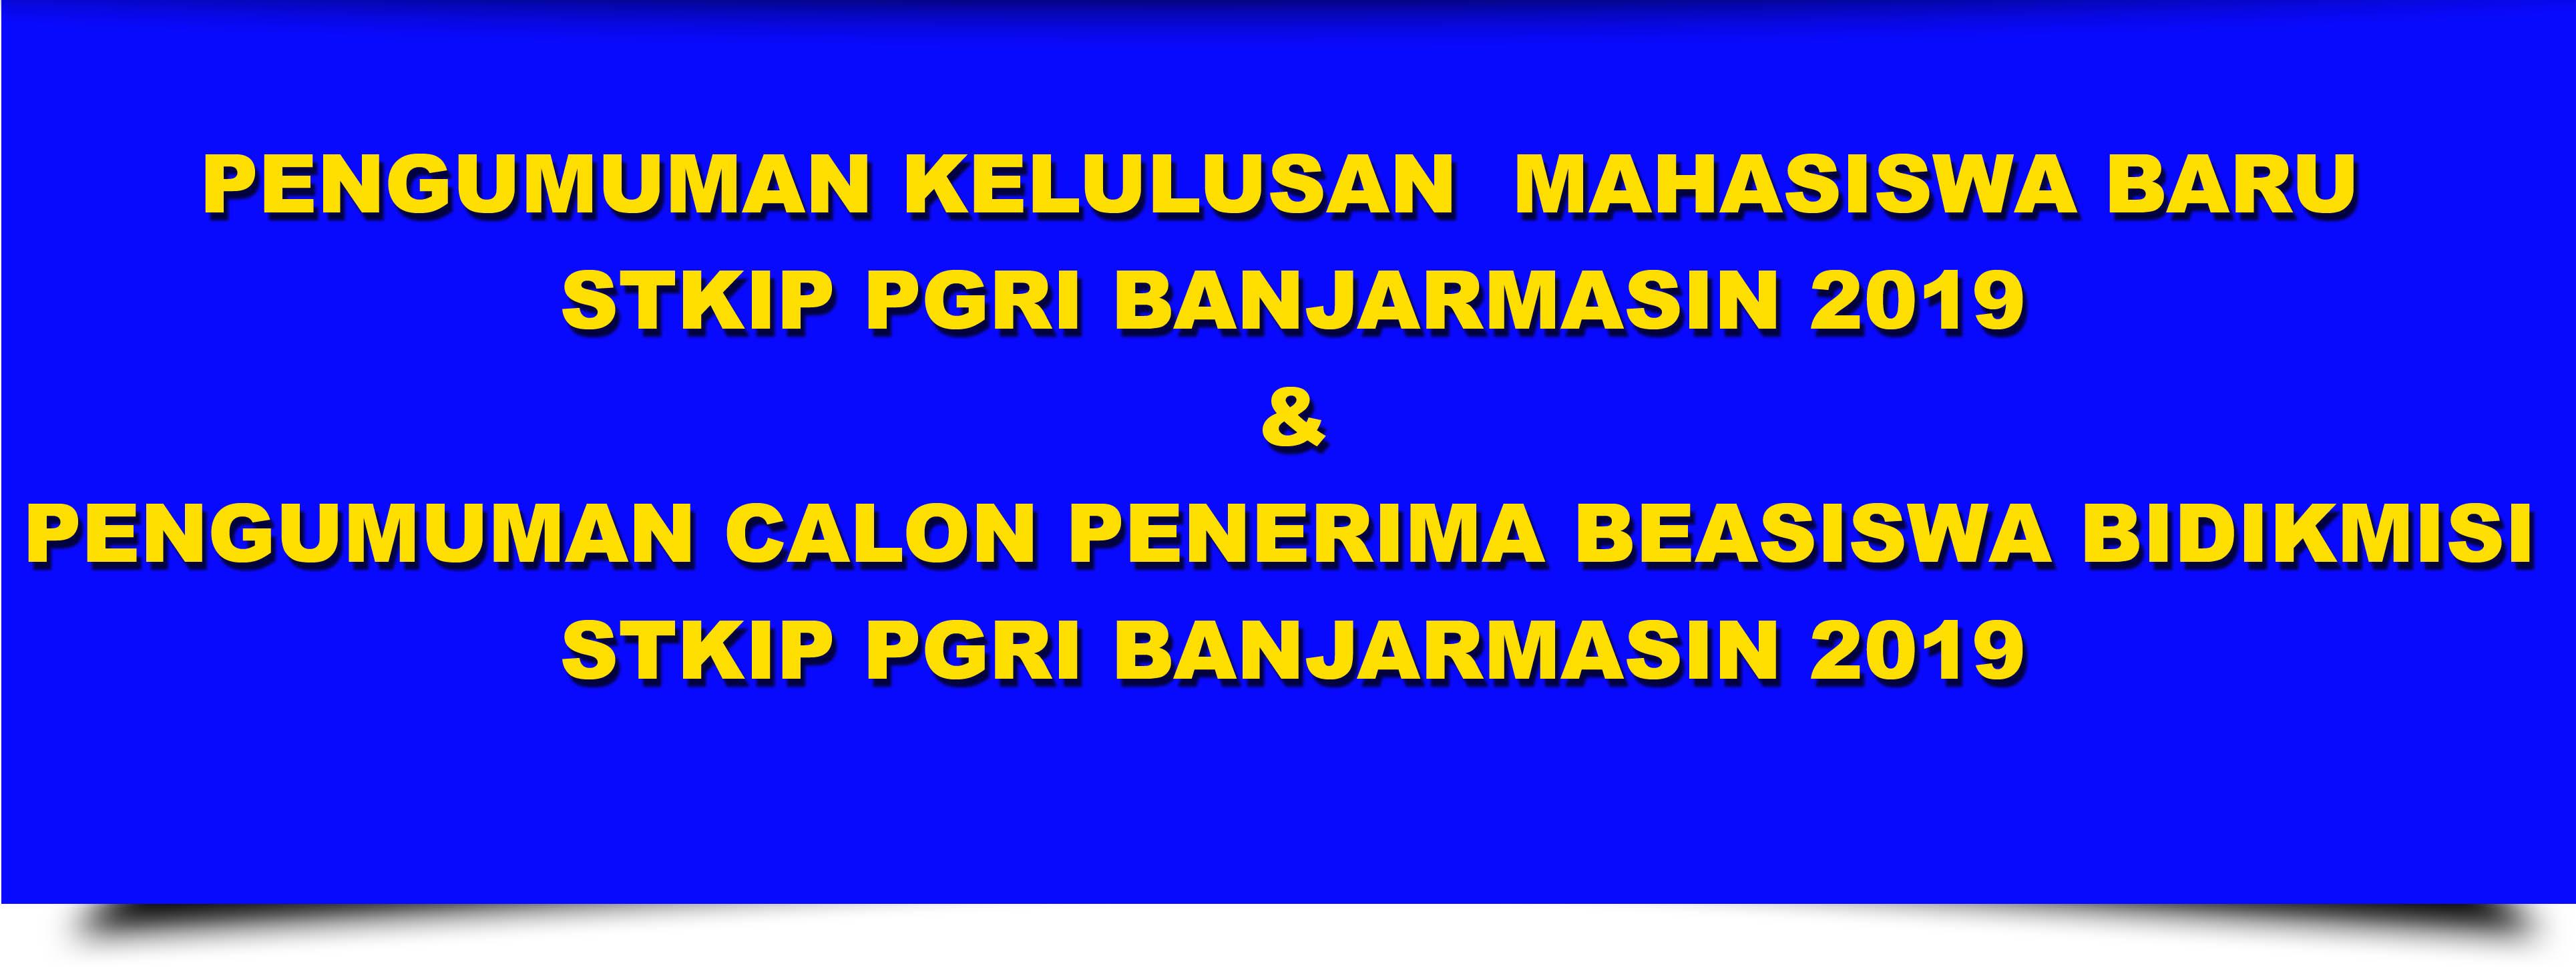 Pengumuman kelulusan Mahasiswa Baru STKIP PGRI Banjarmasin 2019